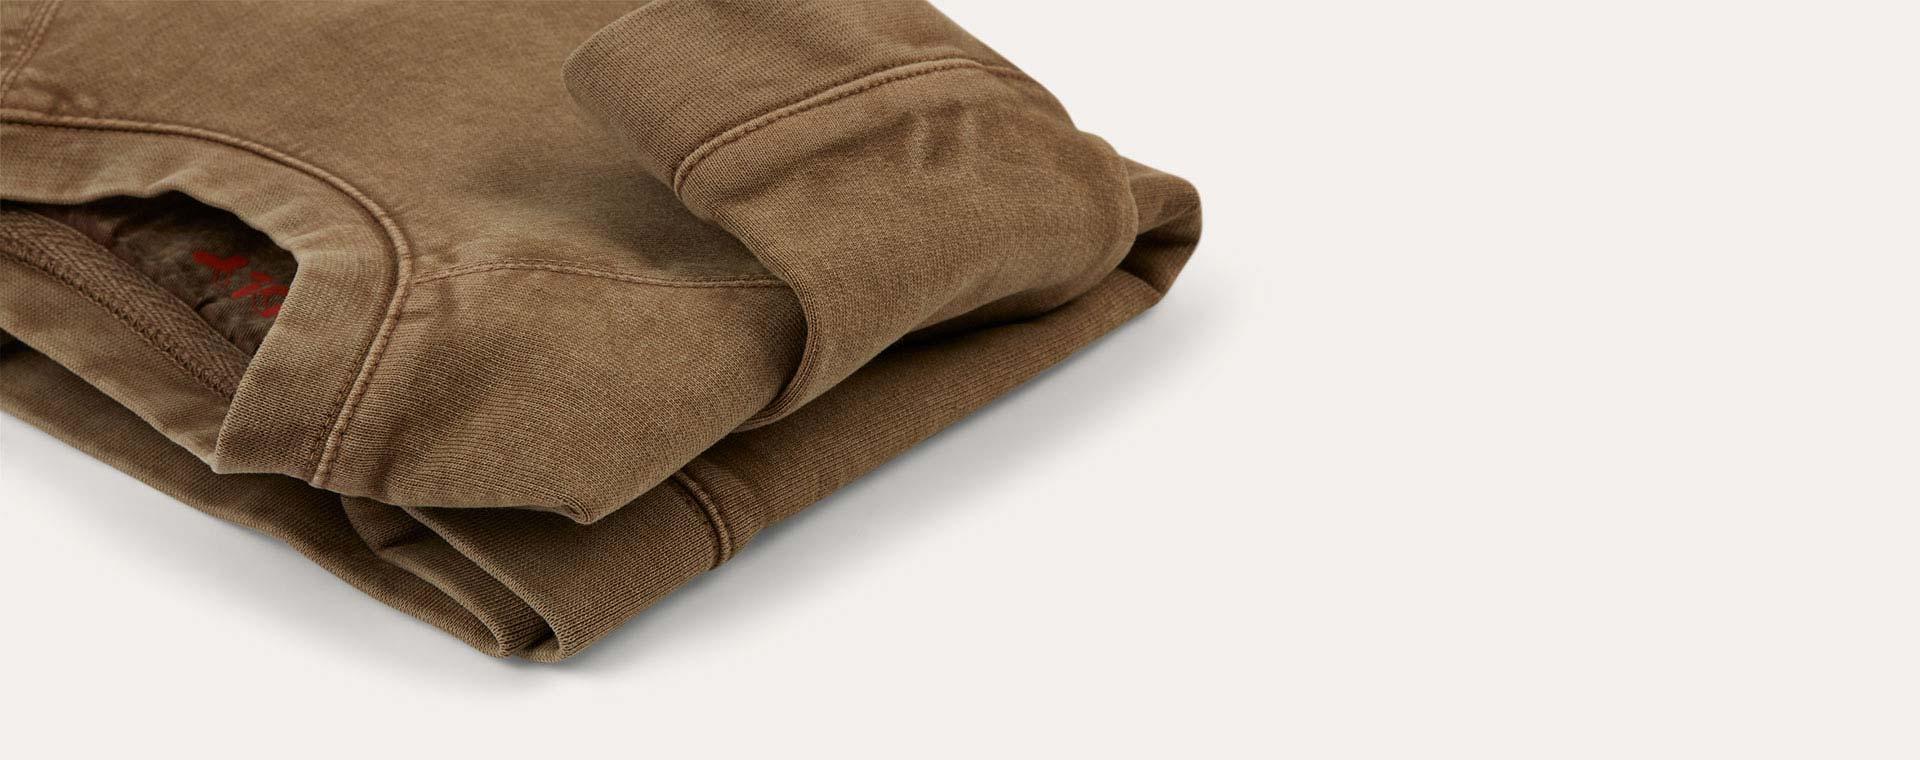 Brown KIDLY Label Sweatshirt